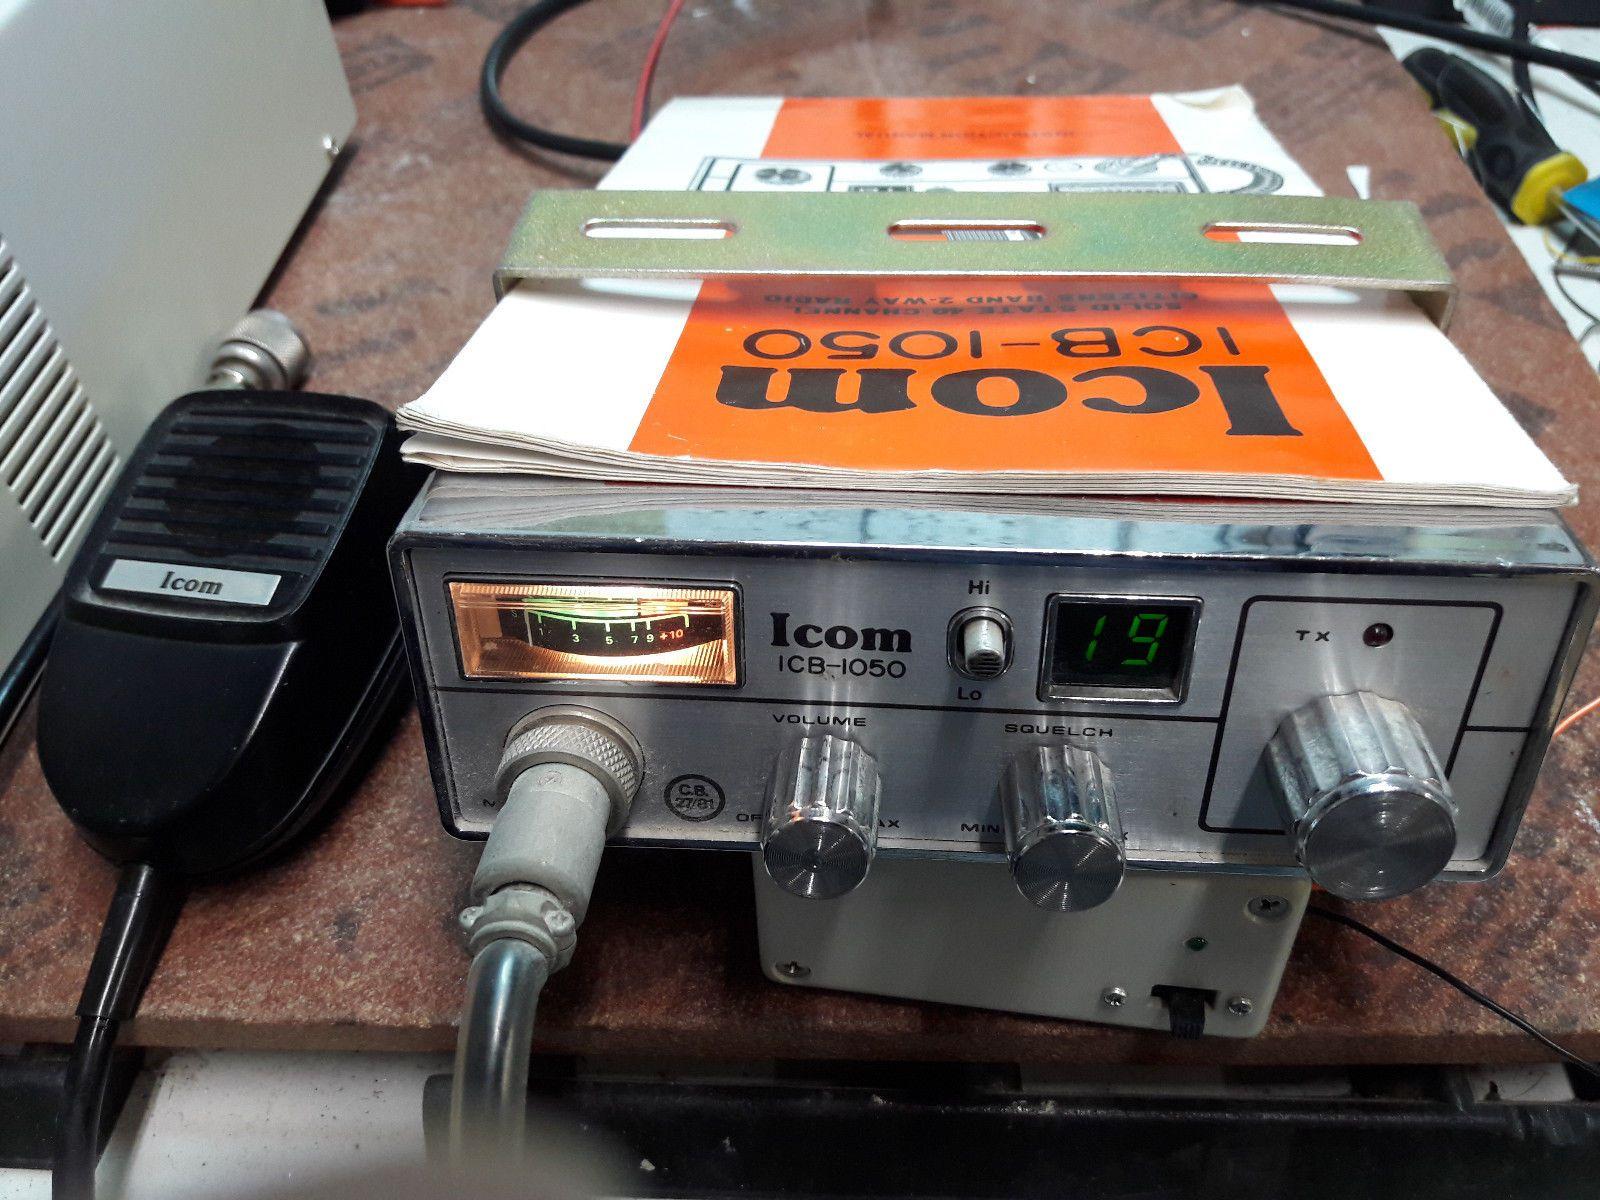 ICB1050 FMuk 40 ch Ham radio, Espresso machine